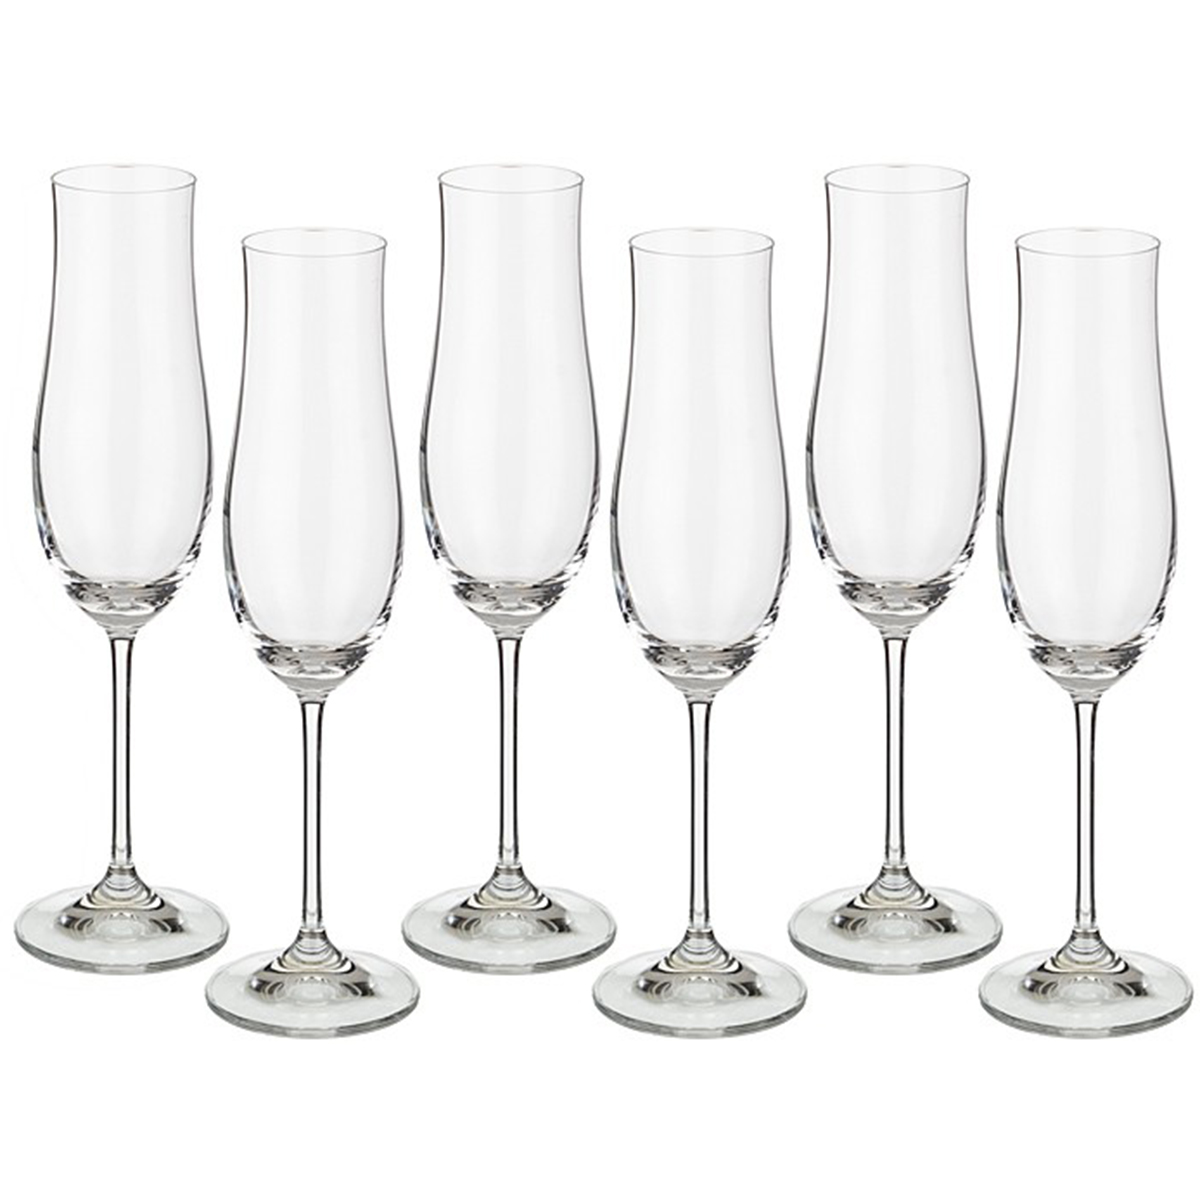 Набор бокалов для шампанского Bohemia Crystal Attimo, 180 мл, 6 шт набор бокалов для шампанского bohemia crystal оливия 190 мл 6 шт